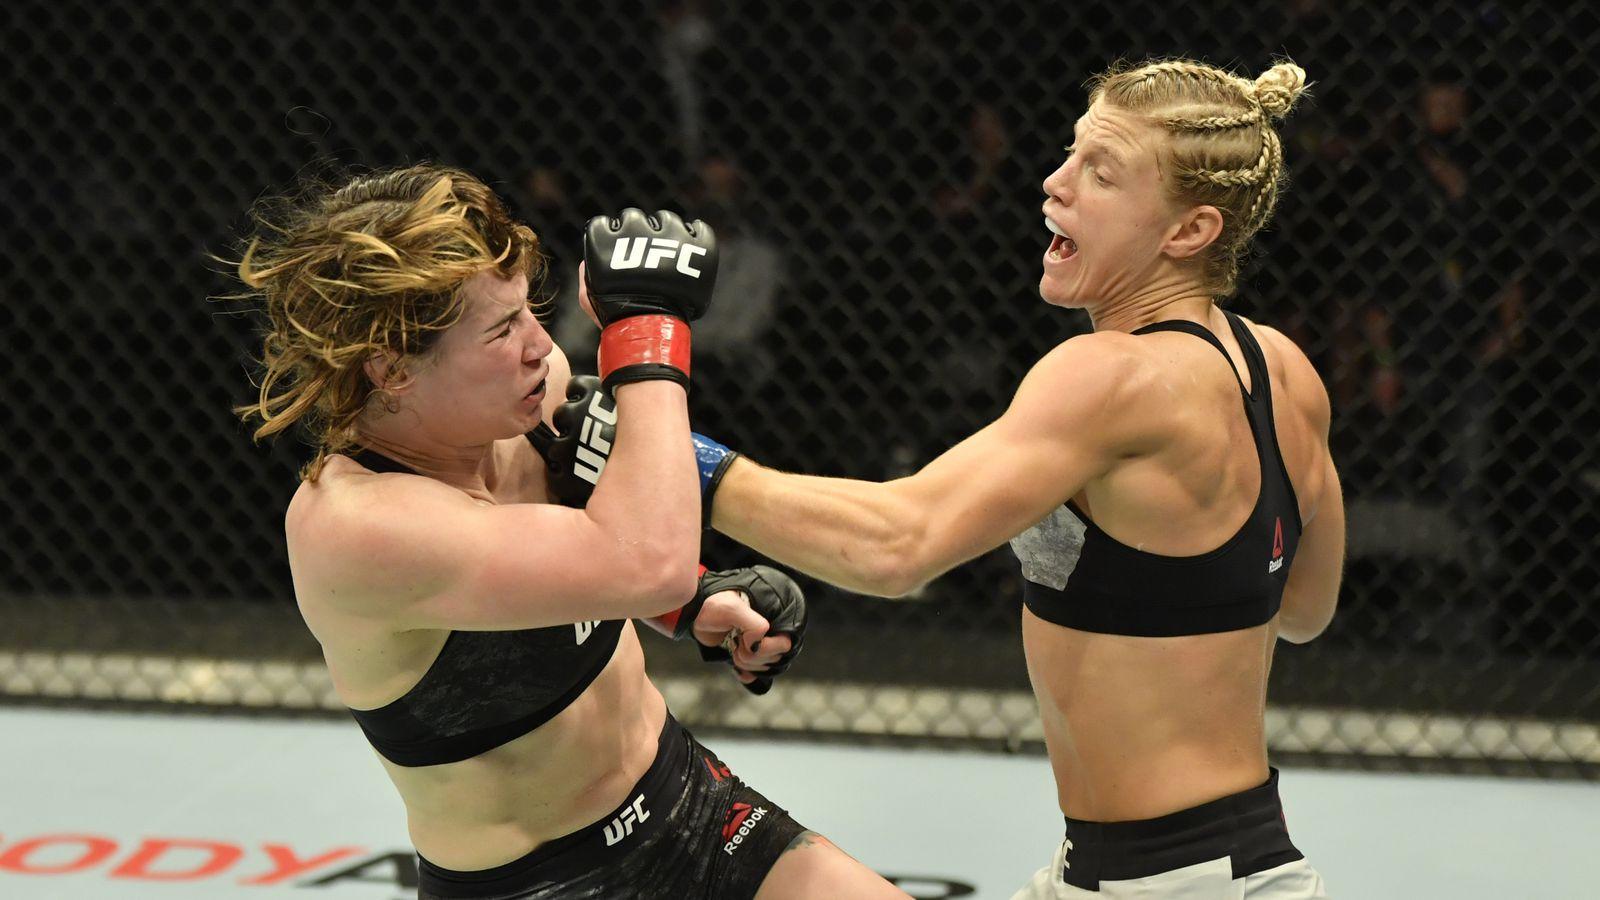 Manon Fiorot to fighting Mayra Bueno Silva at Sept. 25 UFC show